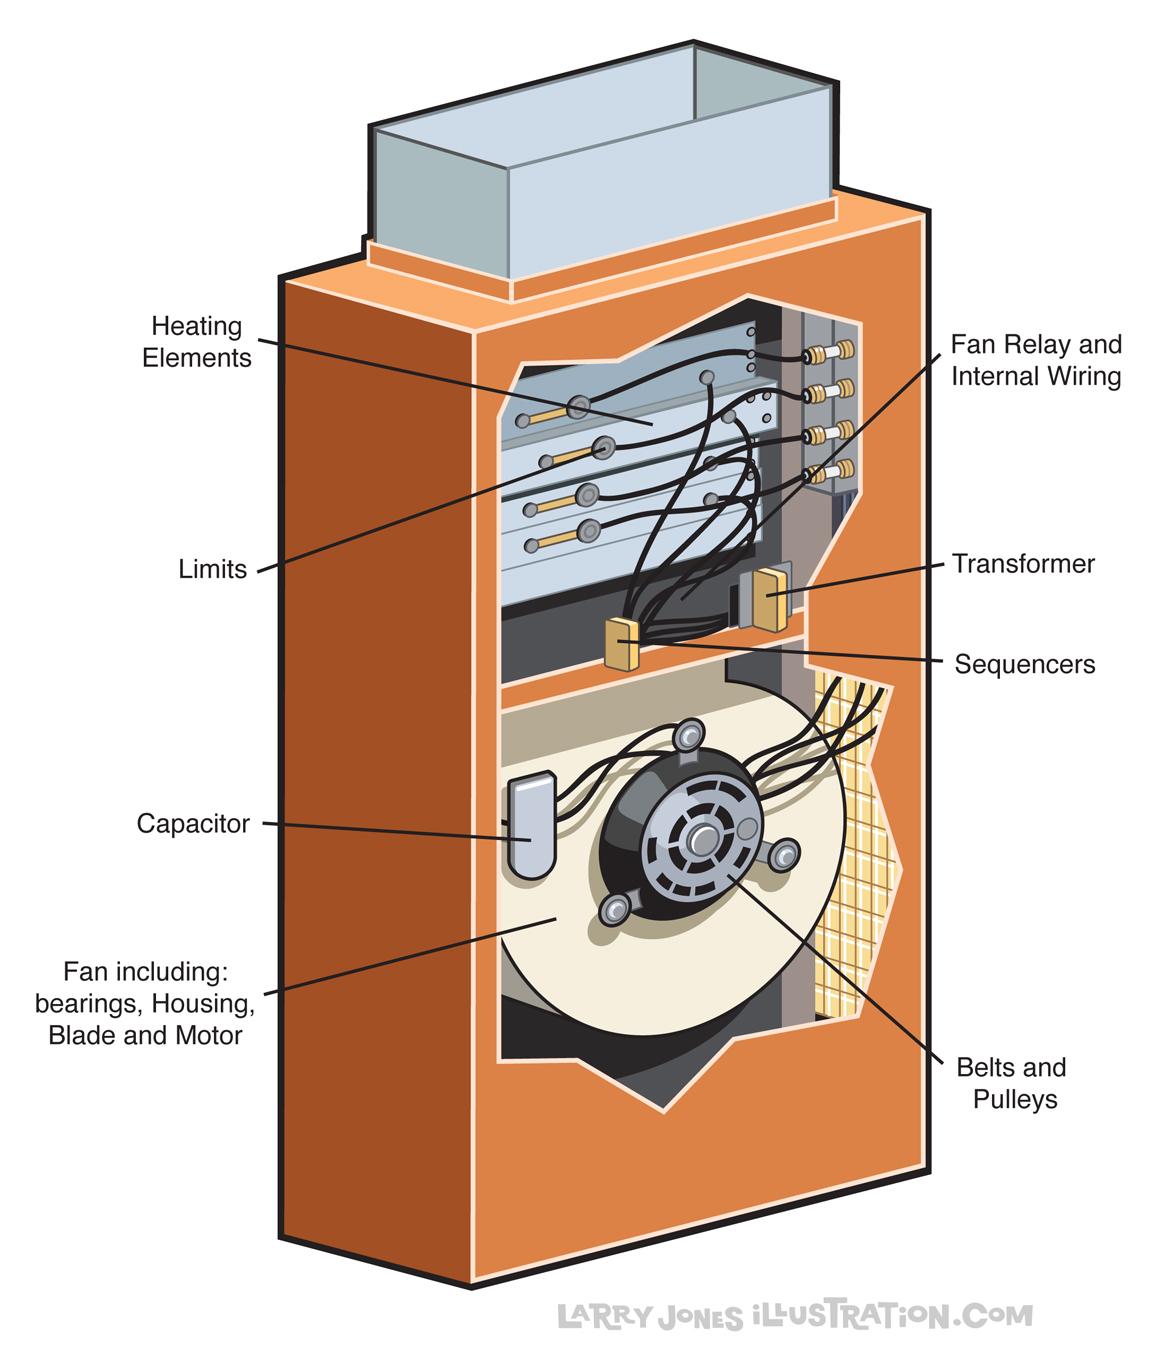 BGE-electric-heat-illustration.jpg